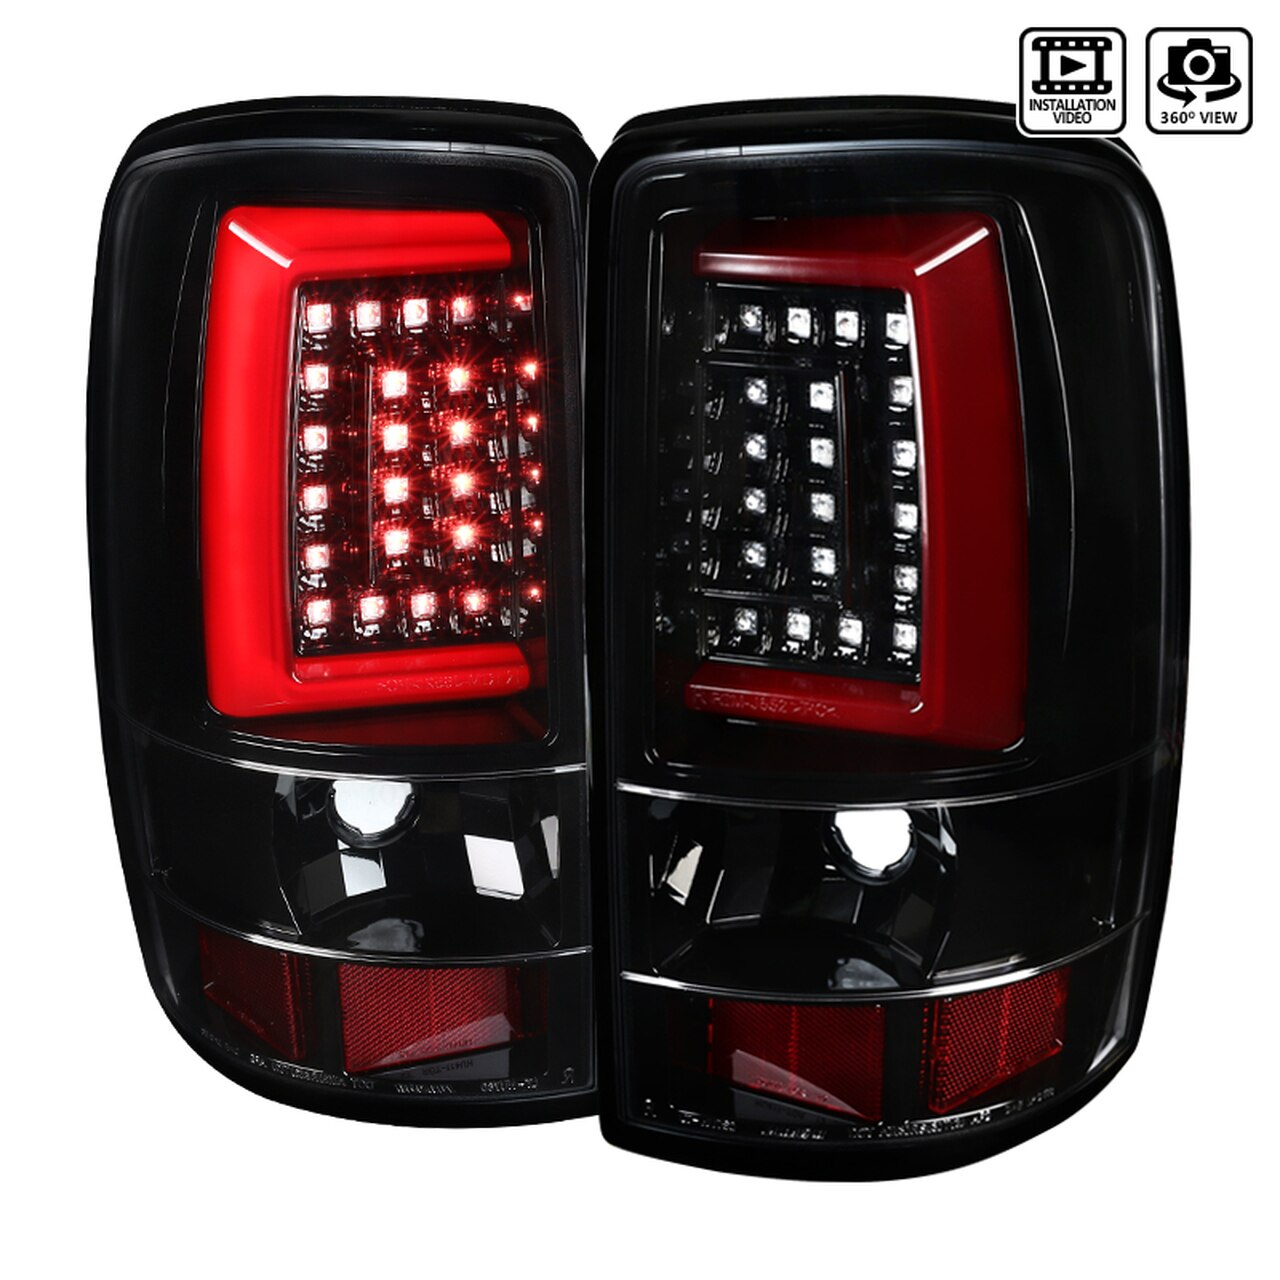 2000-2006 Chevrolet GMC Suburban/Tahoe/Yukon/Yukon XL Denali LED Tail Lights (Jet Black Housing/Clear Lens)